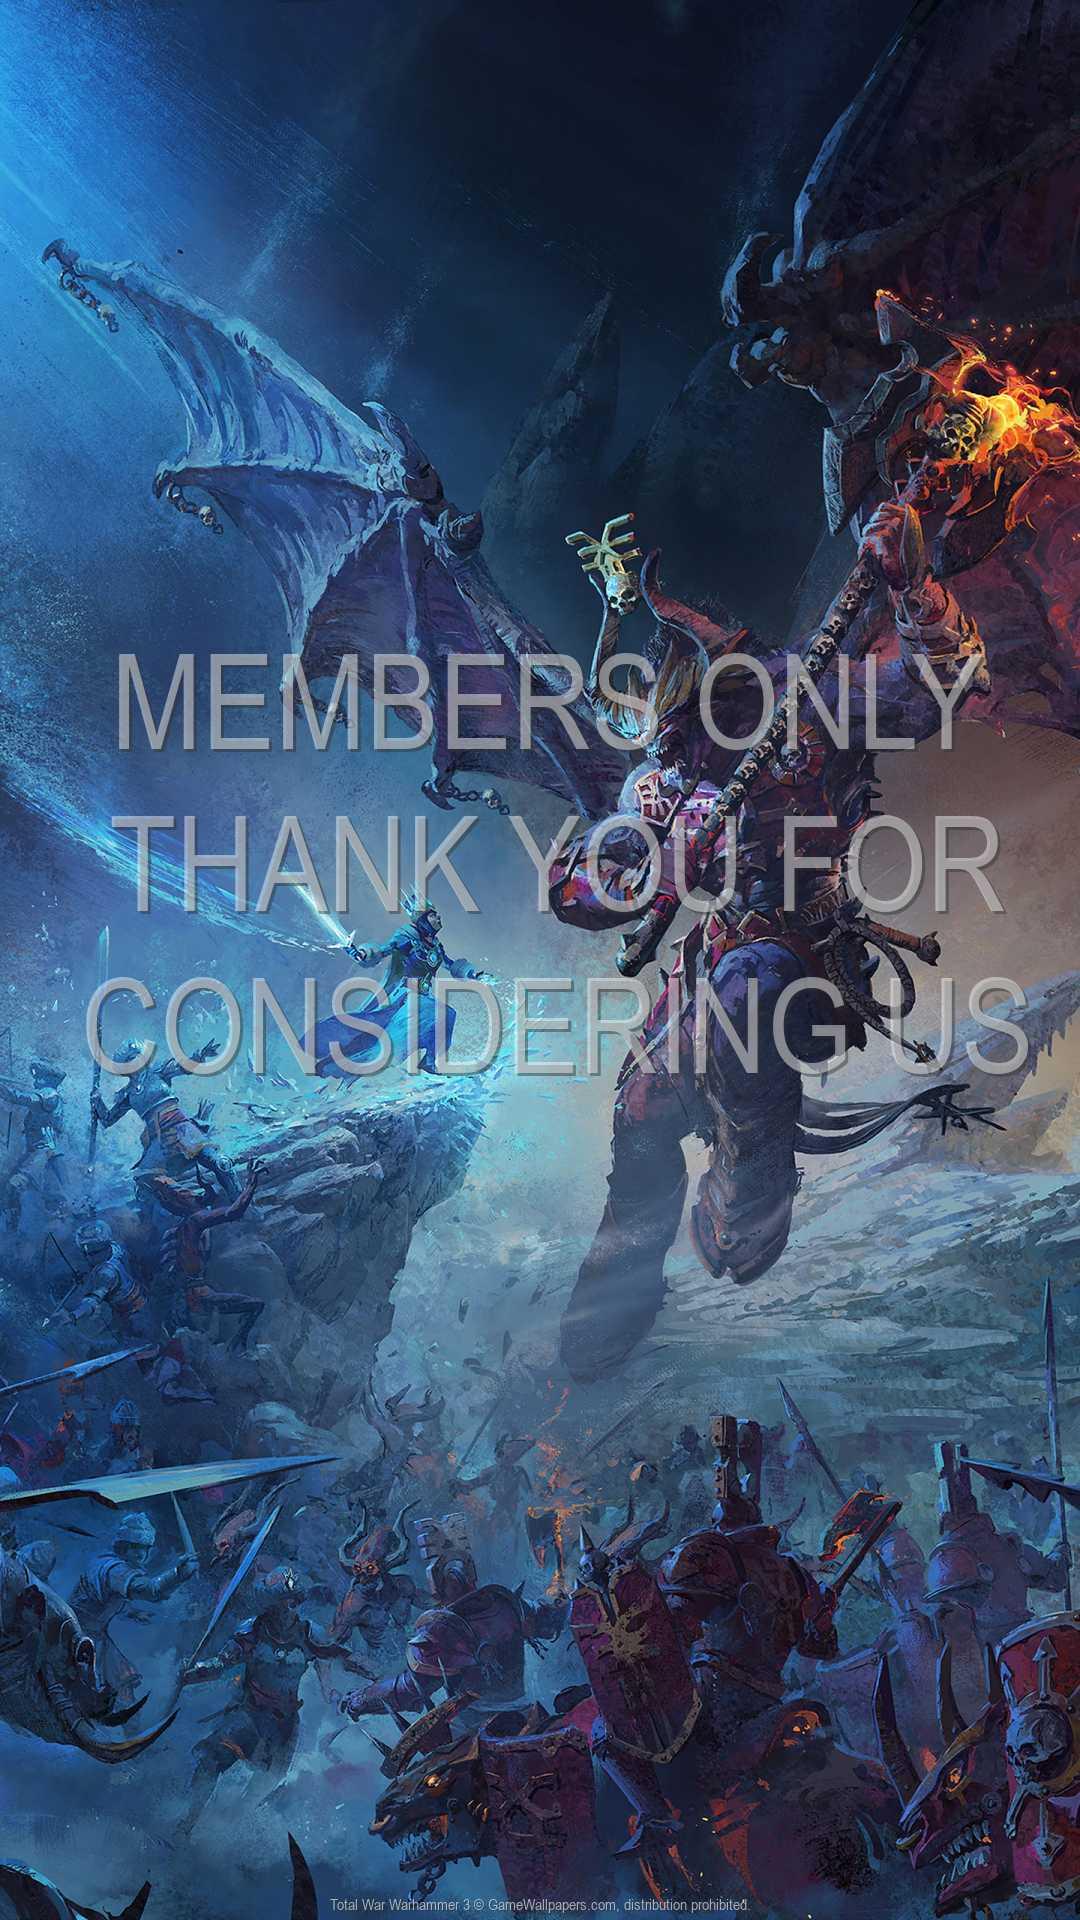 Total War: Warhammer 3 1080p Vertical Mobile wallpaper or background 01